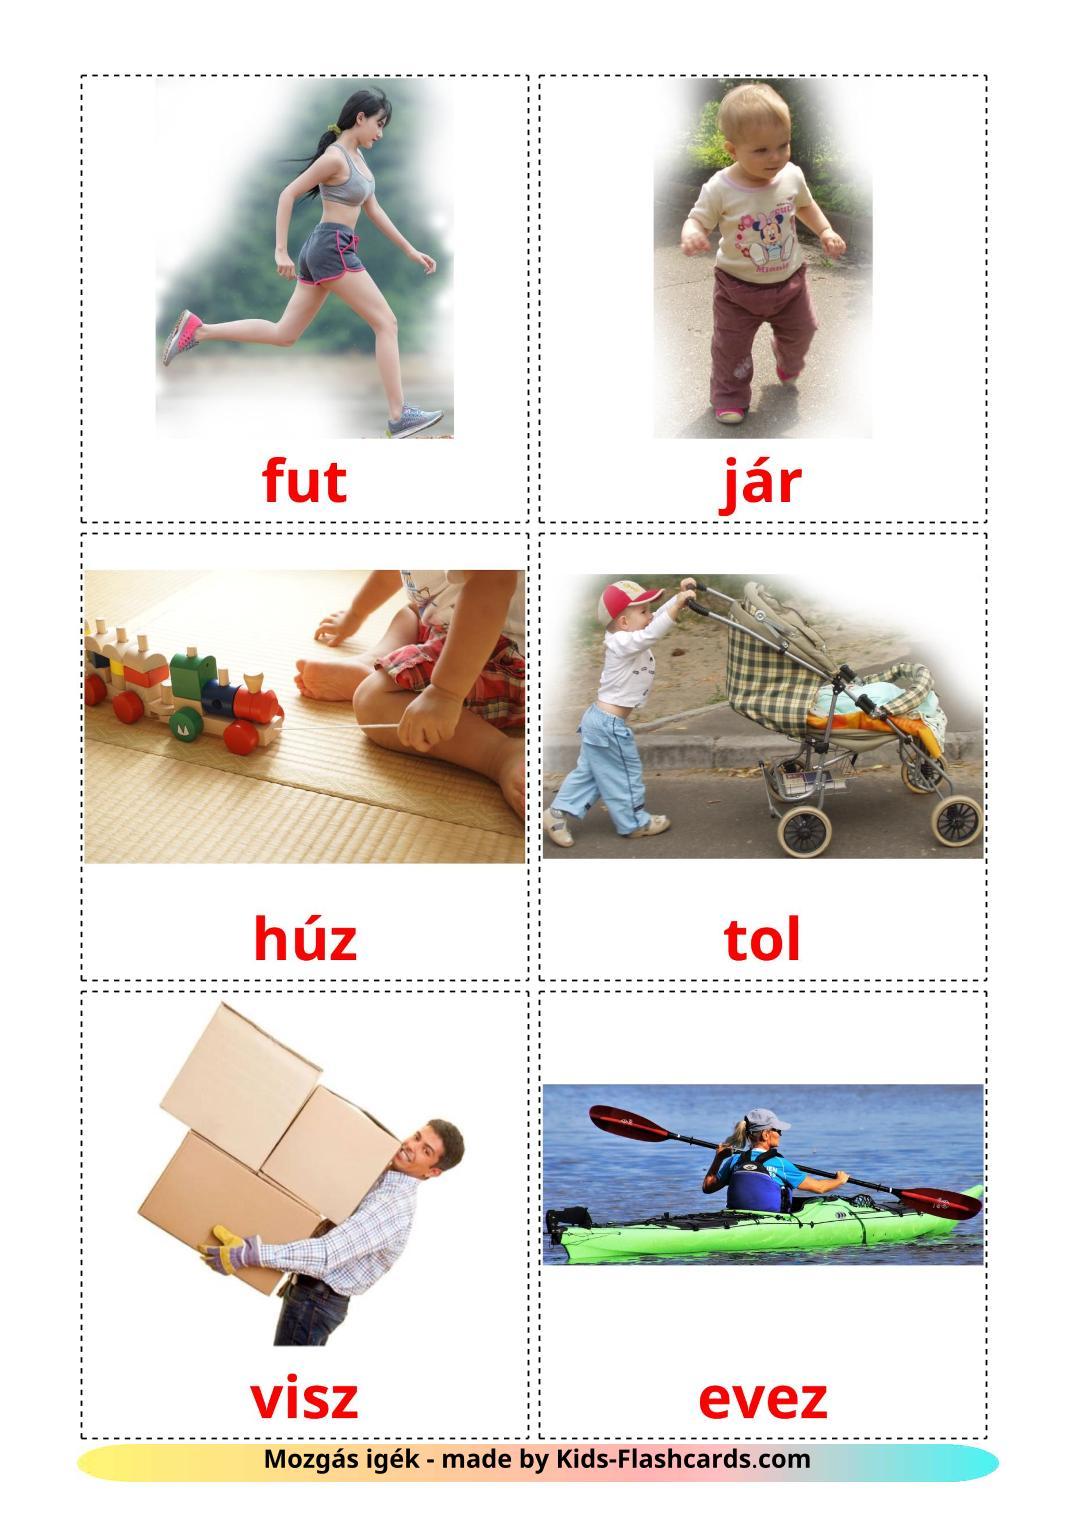 Movement verbs - 22 Free Printable hungarian Flashcards